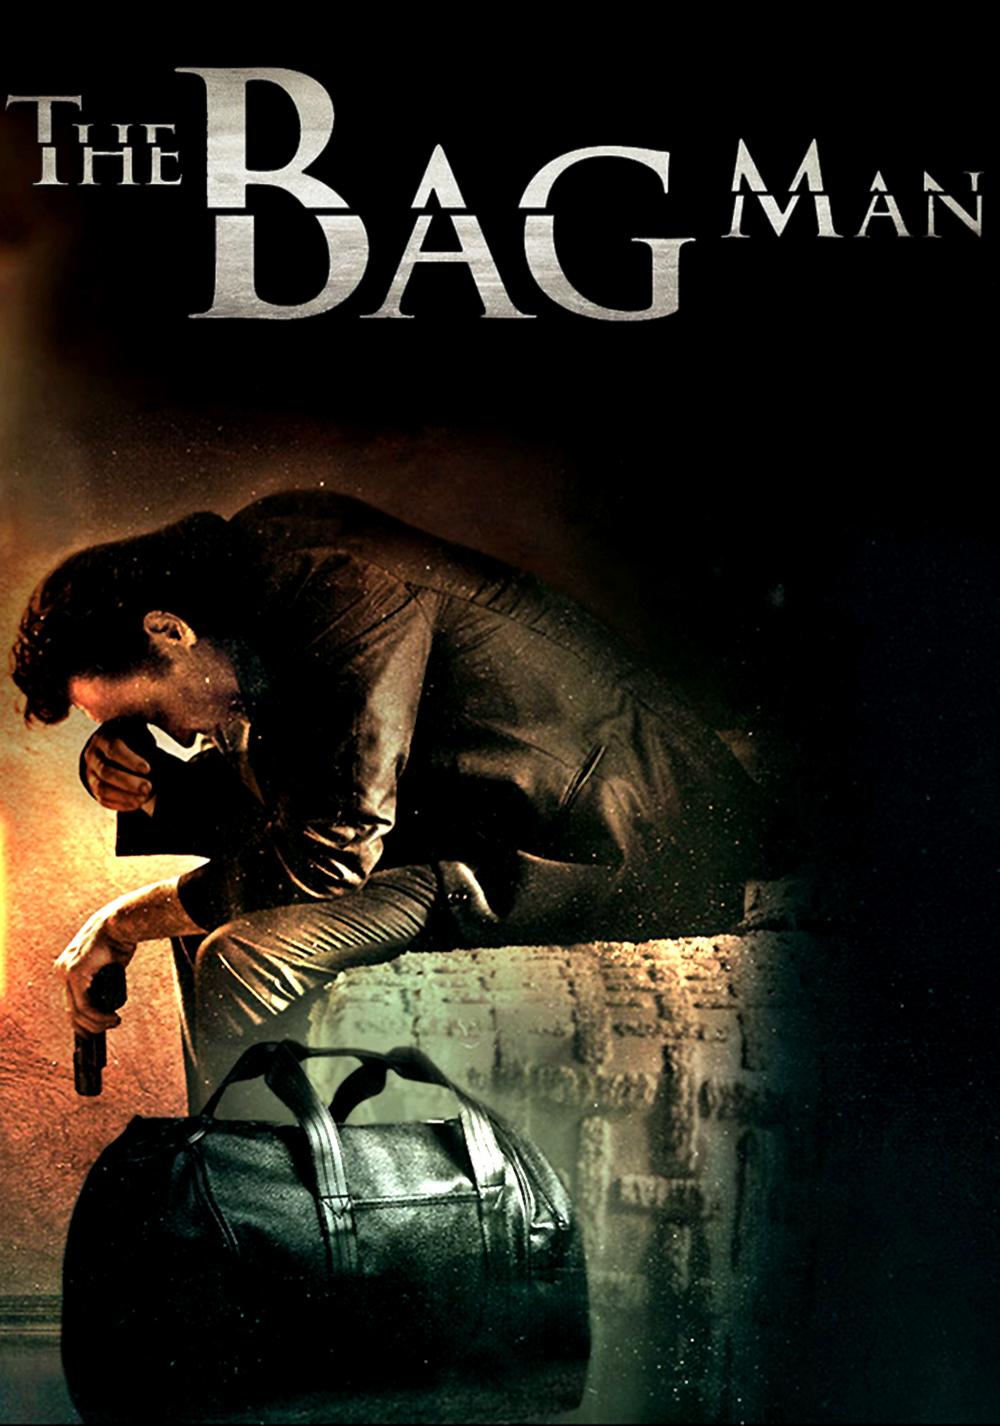 The Bag Man | Movie fanart | fanart.tv